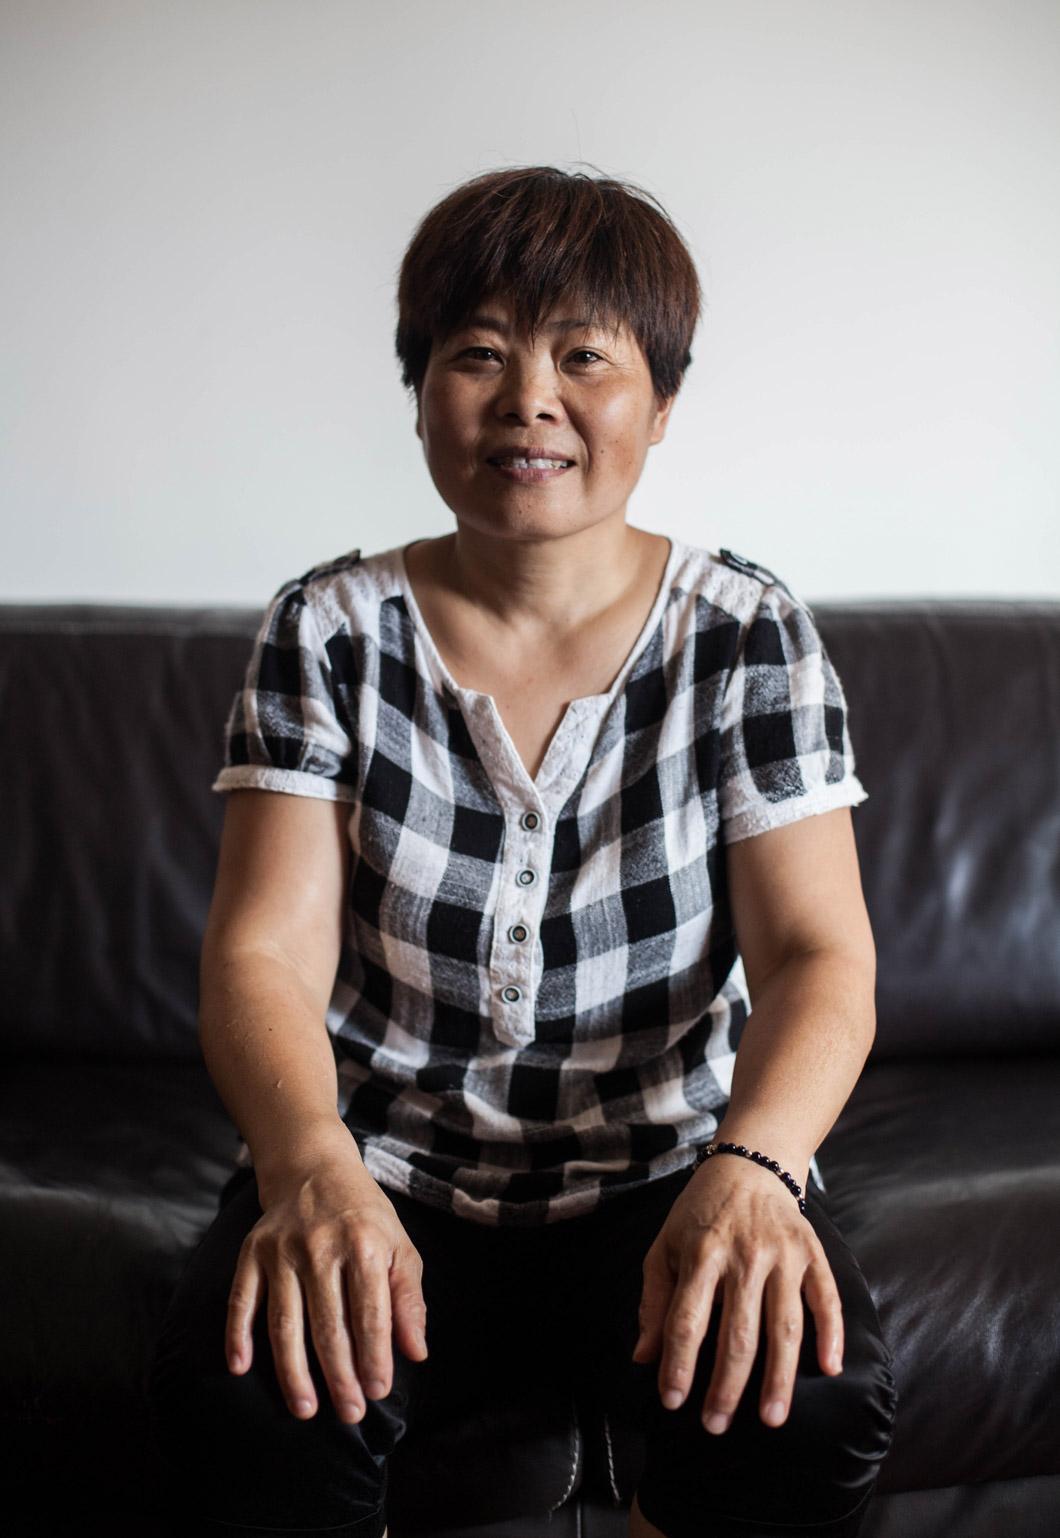 magazeta-professions-in-china-housemaid-23